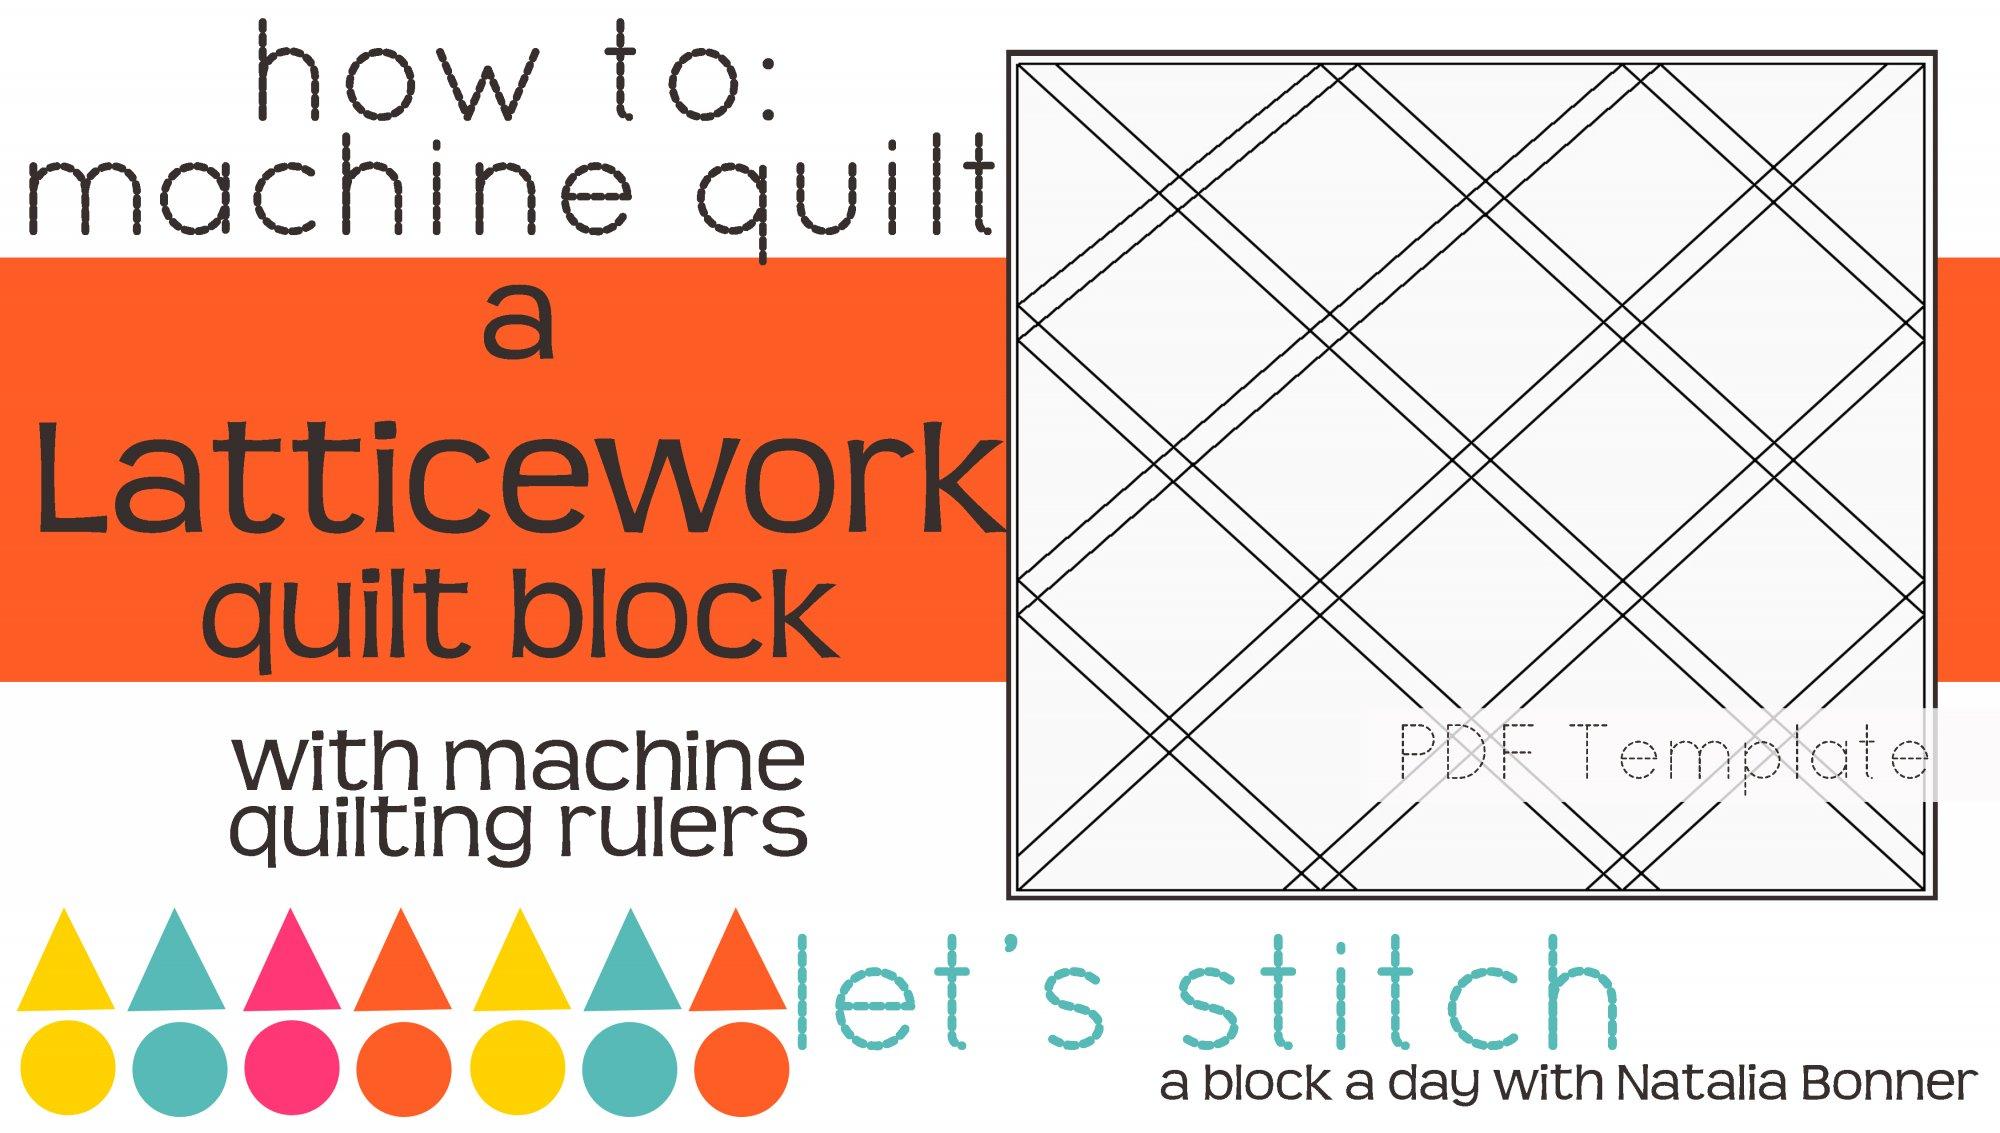 Let's Stitch - A Block a Day With Natalia Bonner - PDF - Latticework